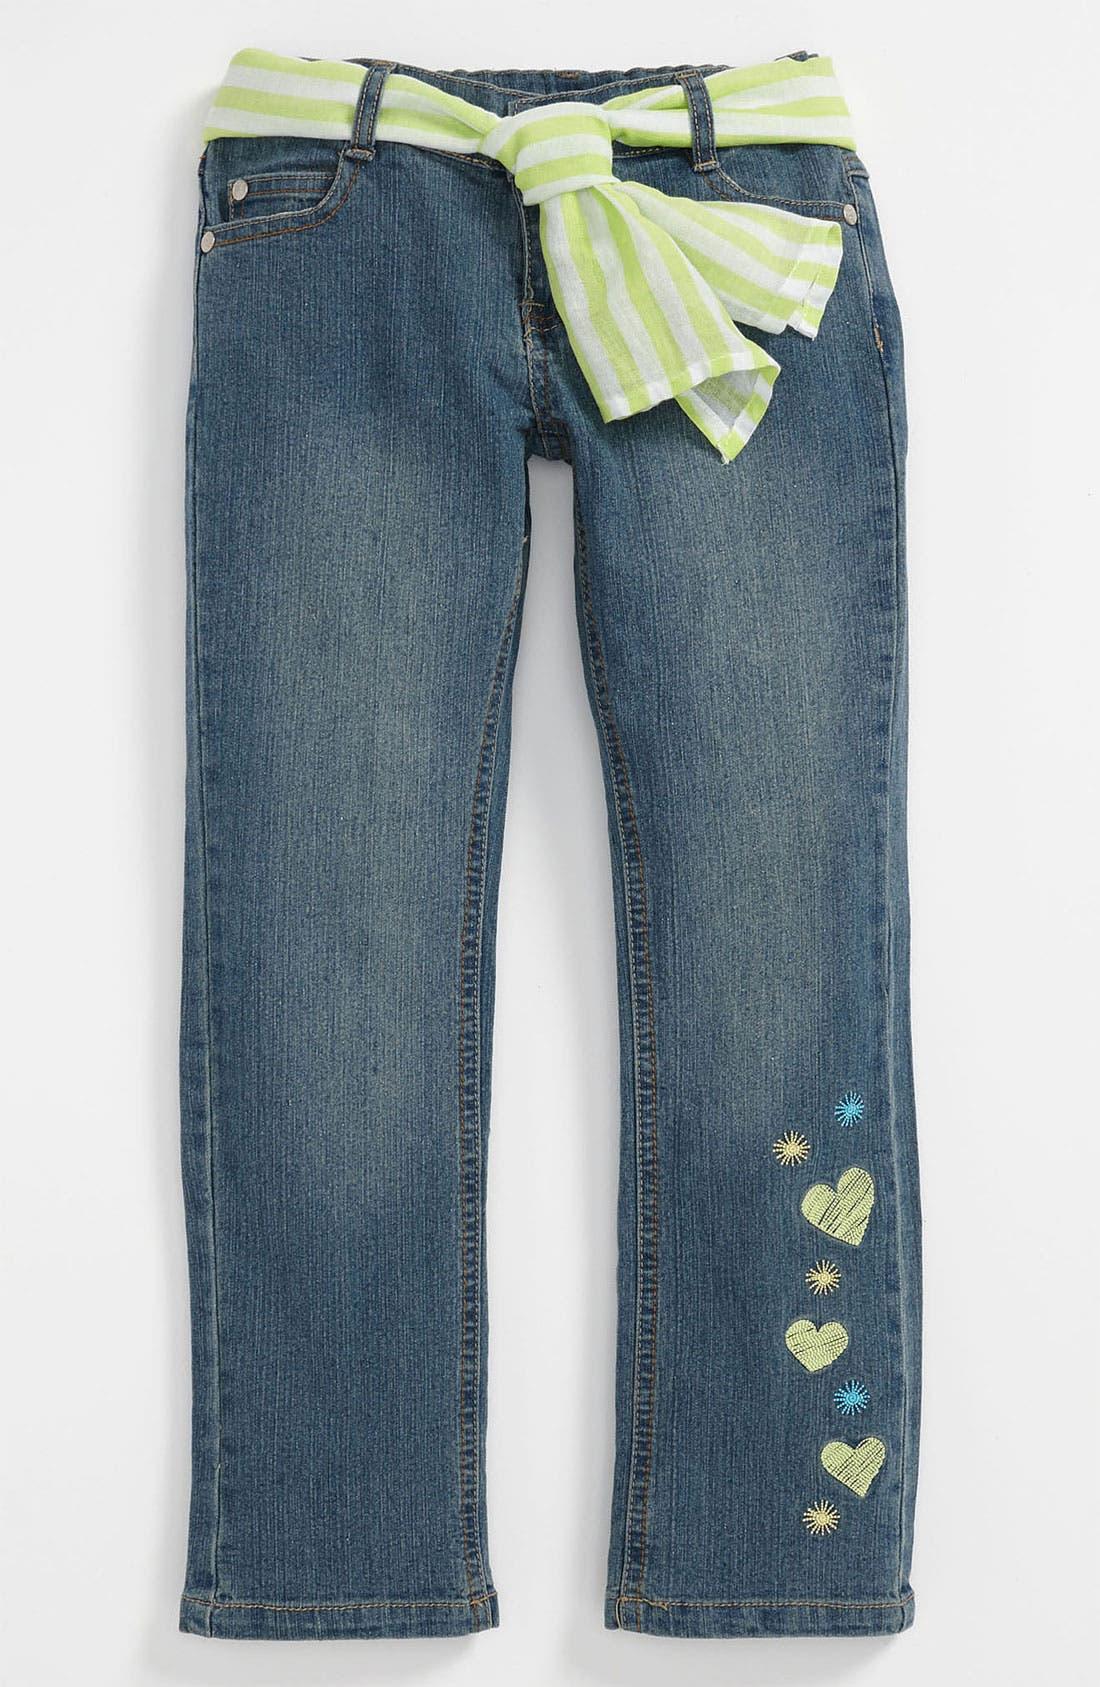 Alternate Image 1 Selected - Pumpkin Patch Embroidered Denim Jeans (Little Girls & Big Girls)